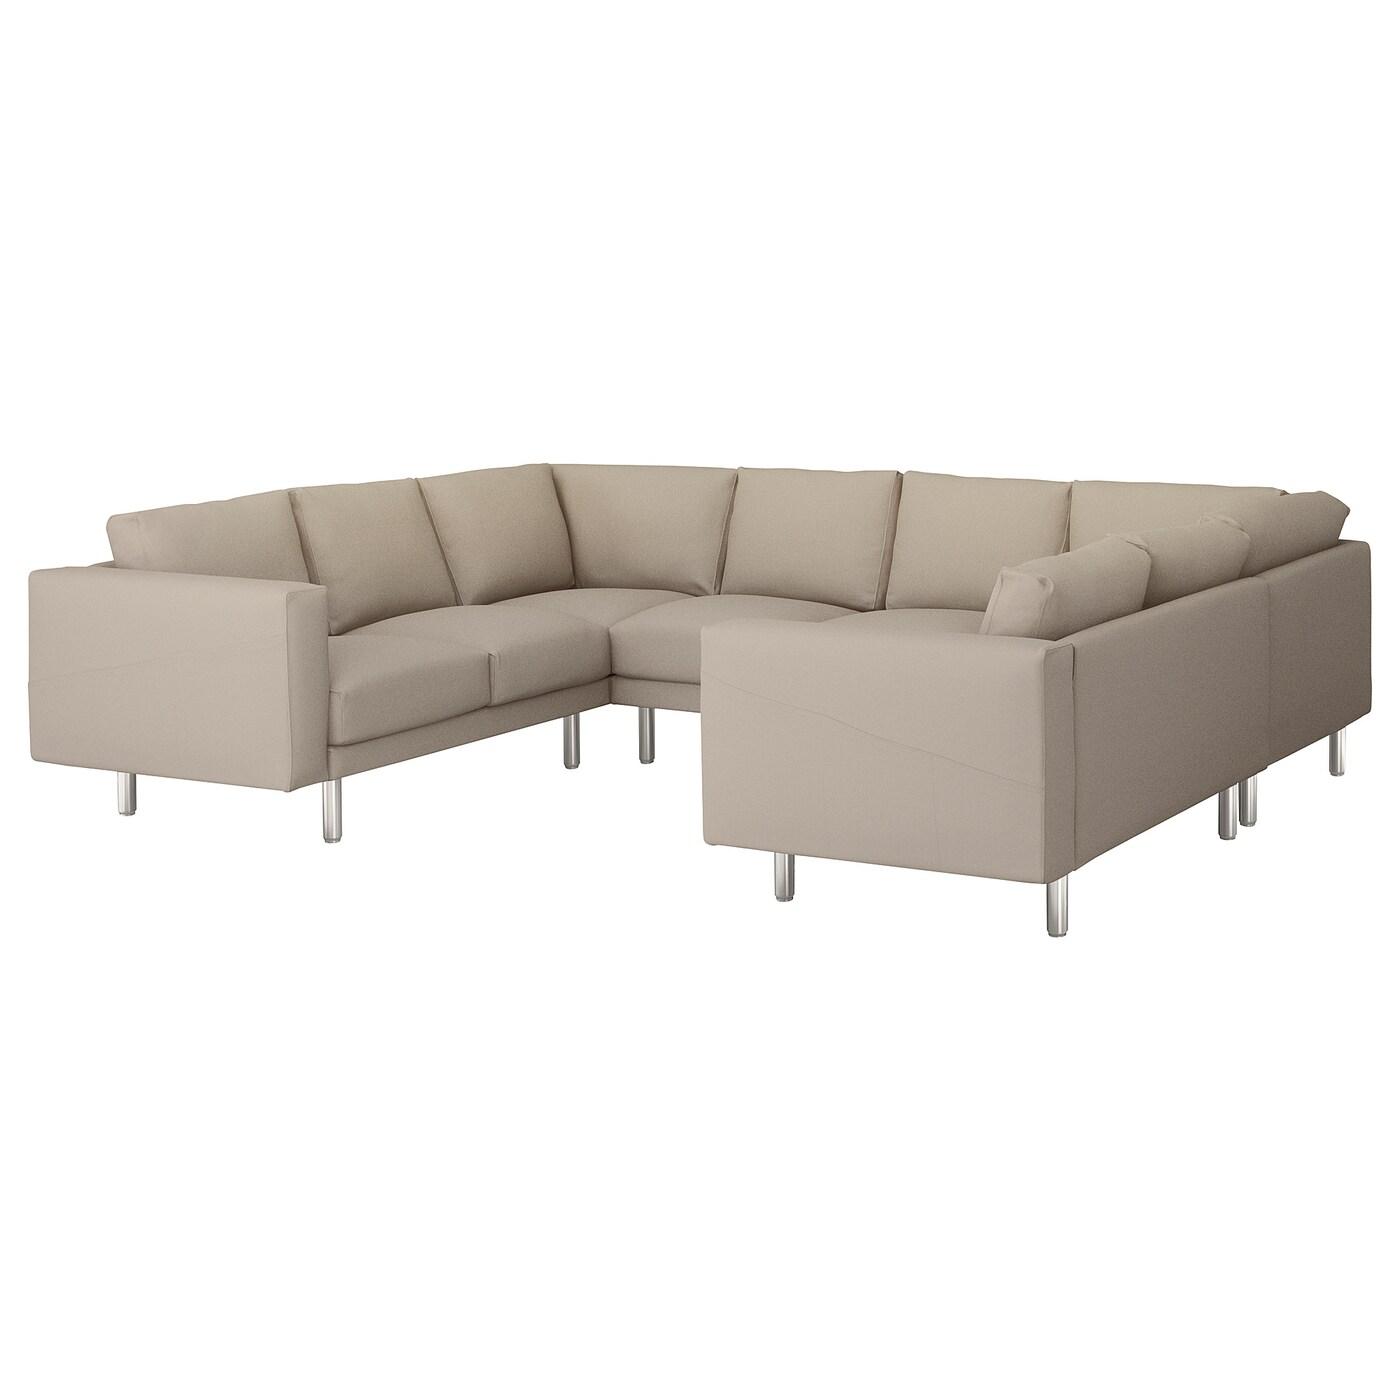 NORSBORG U shaped sofa 6 seat Gräsbo beige metal IKEA